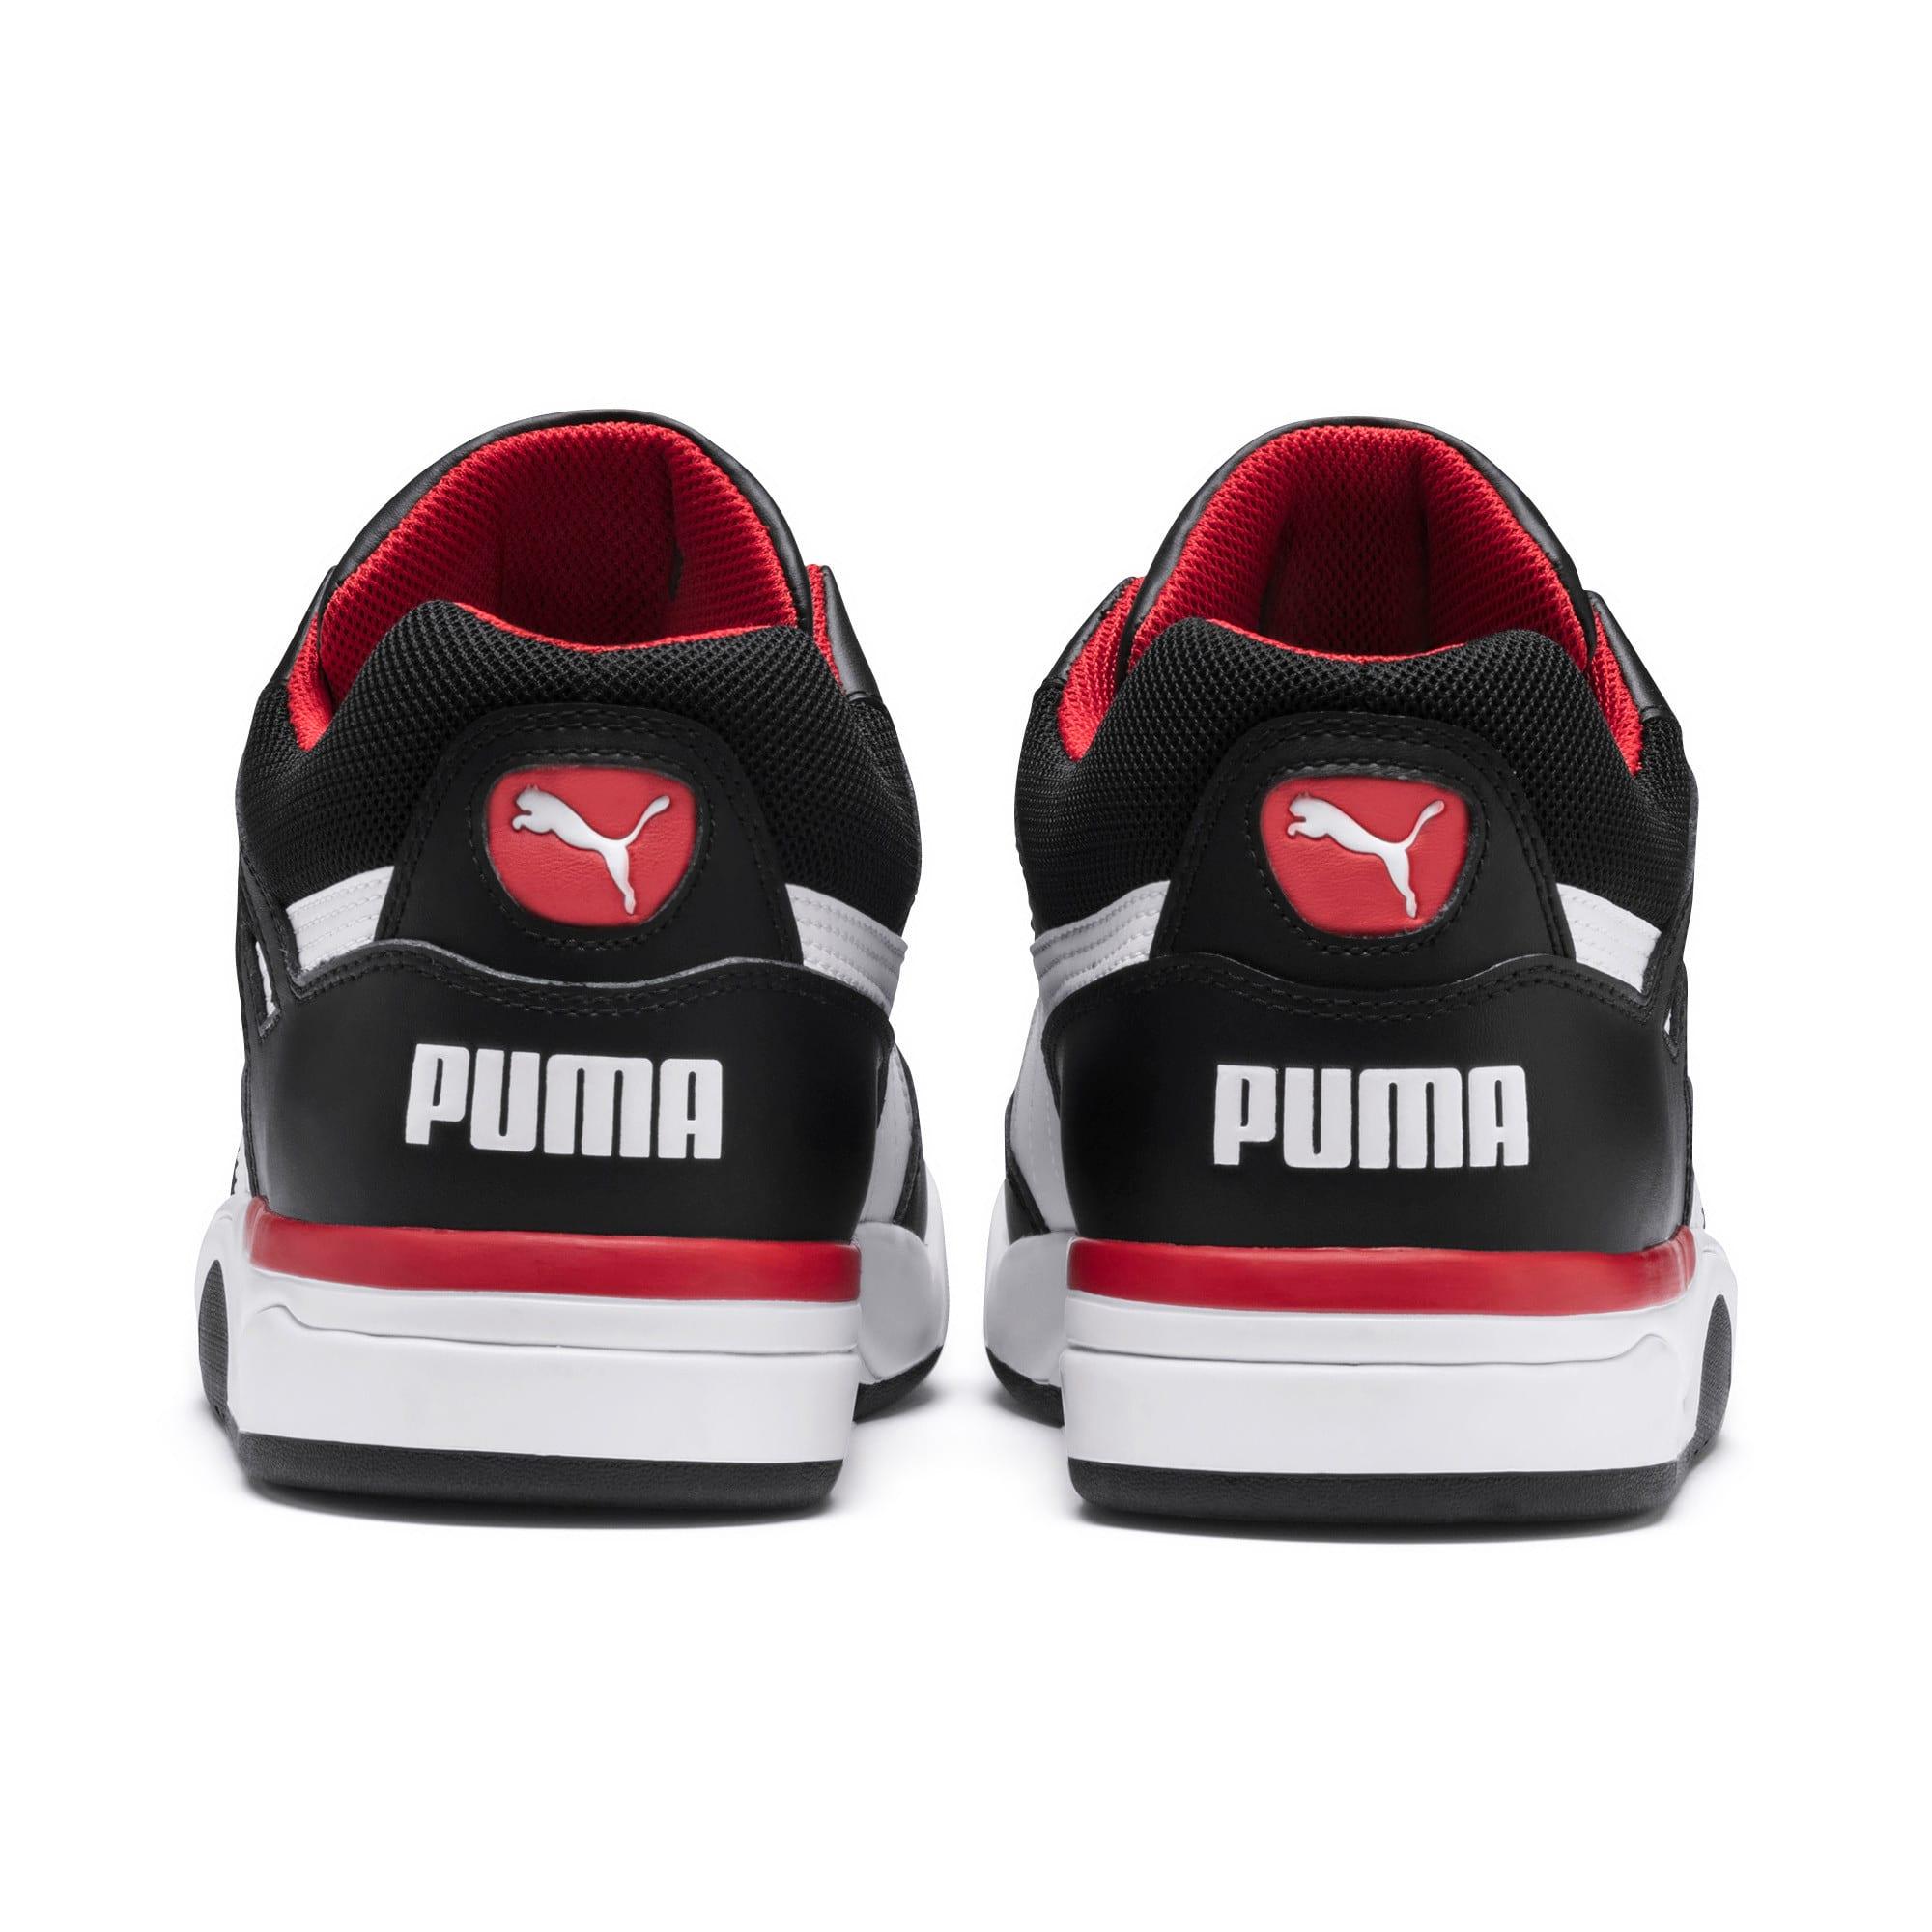 Thumbnail 3 of Basket Palace Guard, Puma Black-Puma White-red, medium